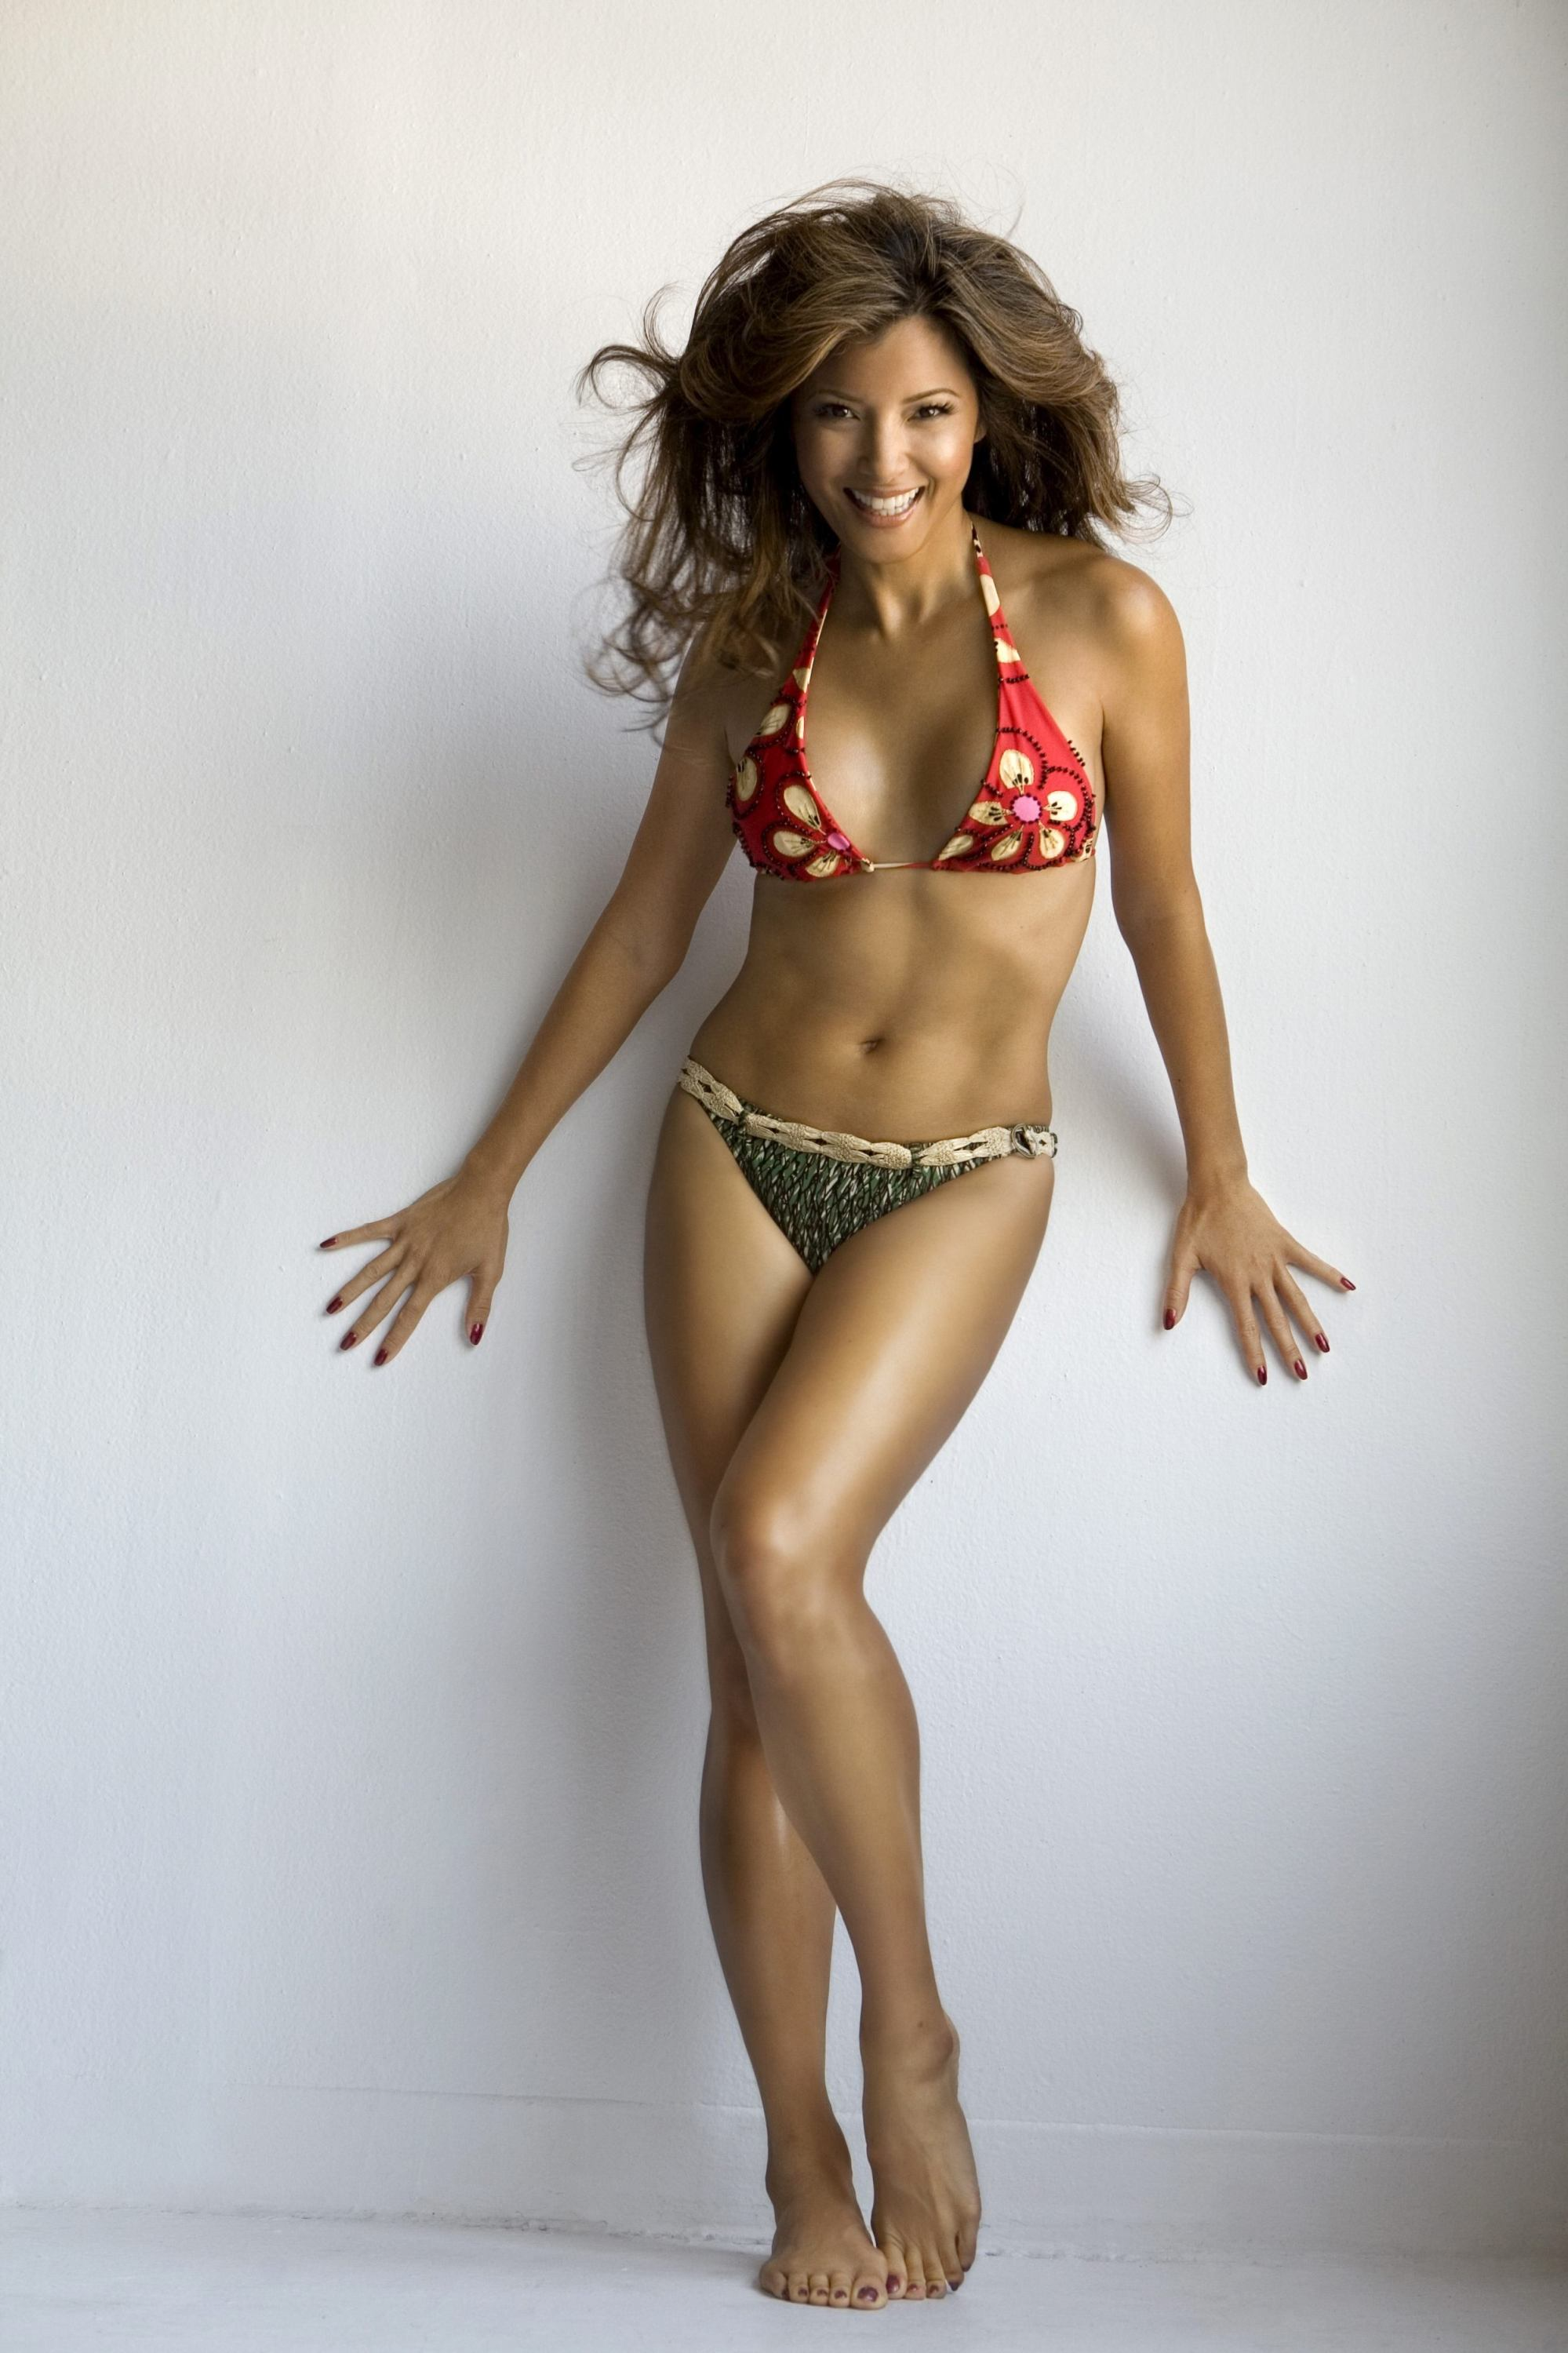 Bikini Nina Bajerska nudes (78 photos), Topless, Leaked, Twitter, bra 2019